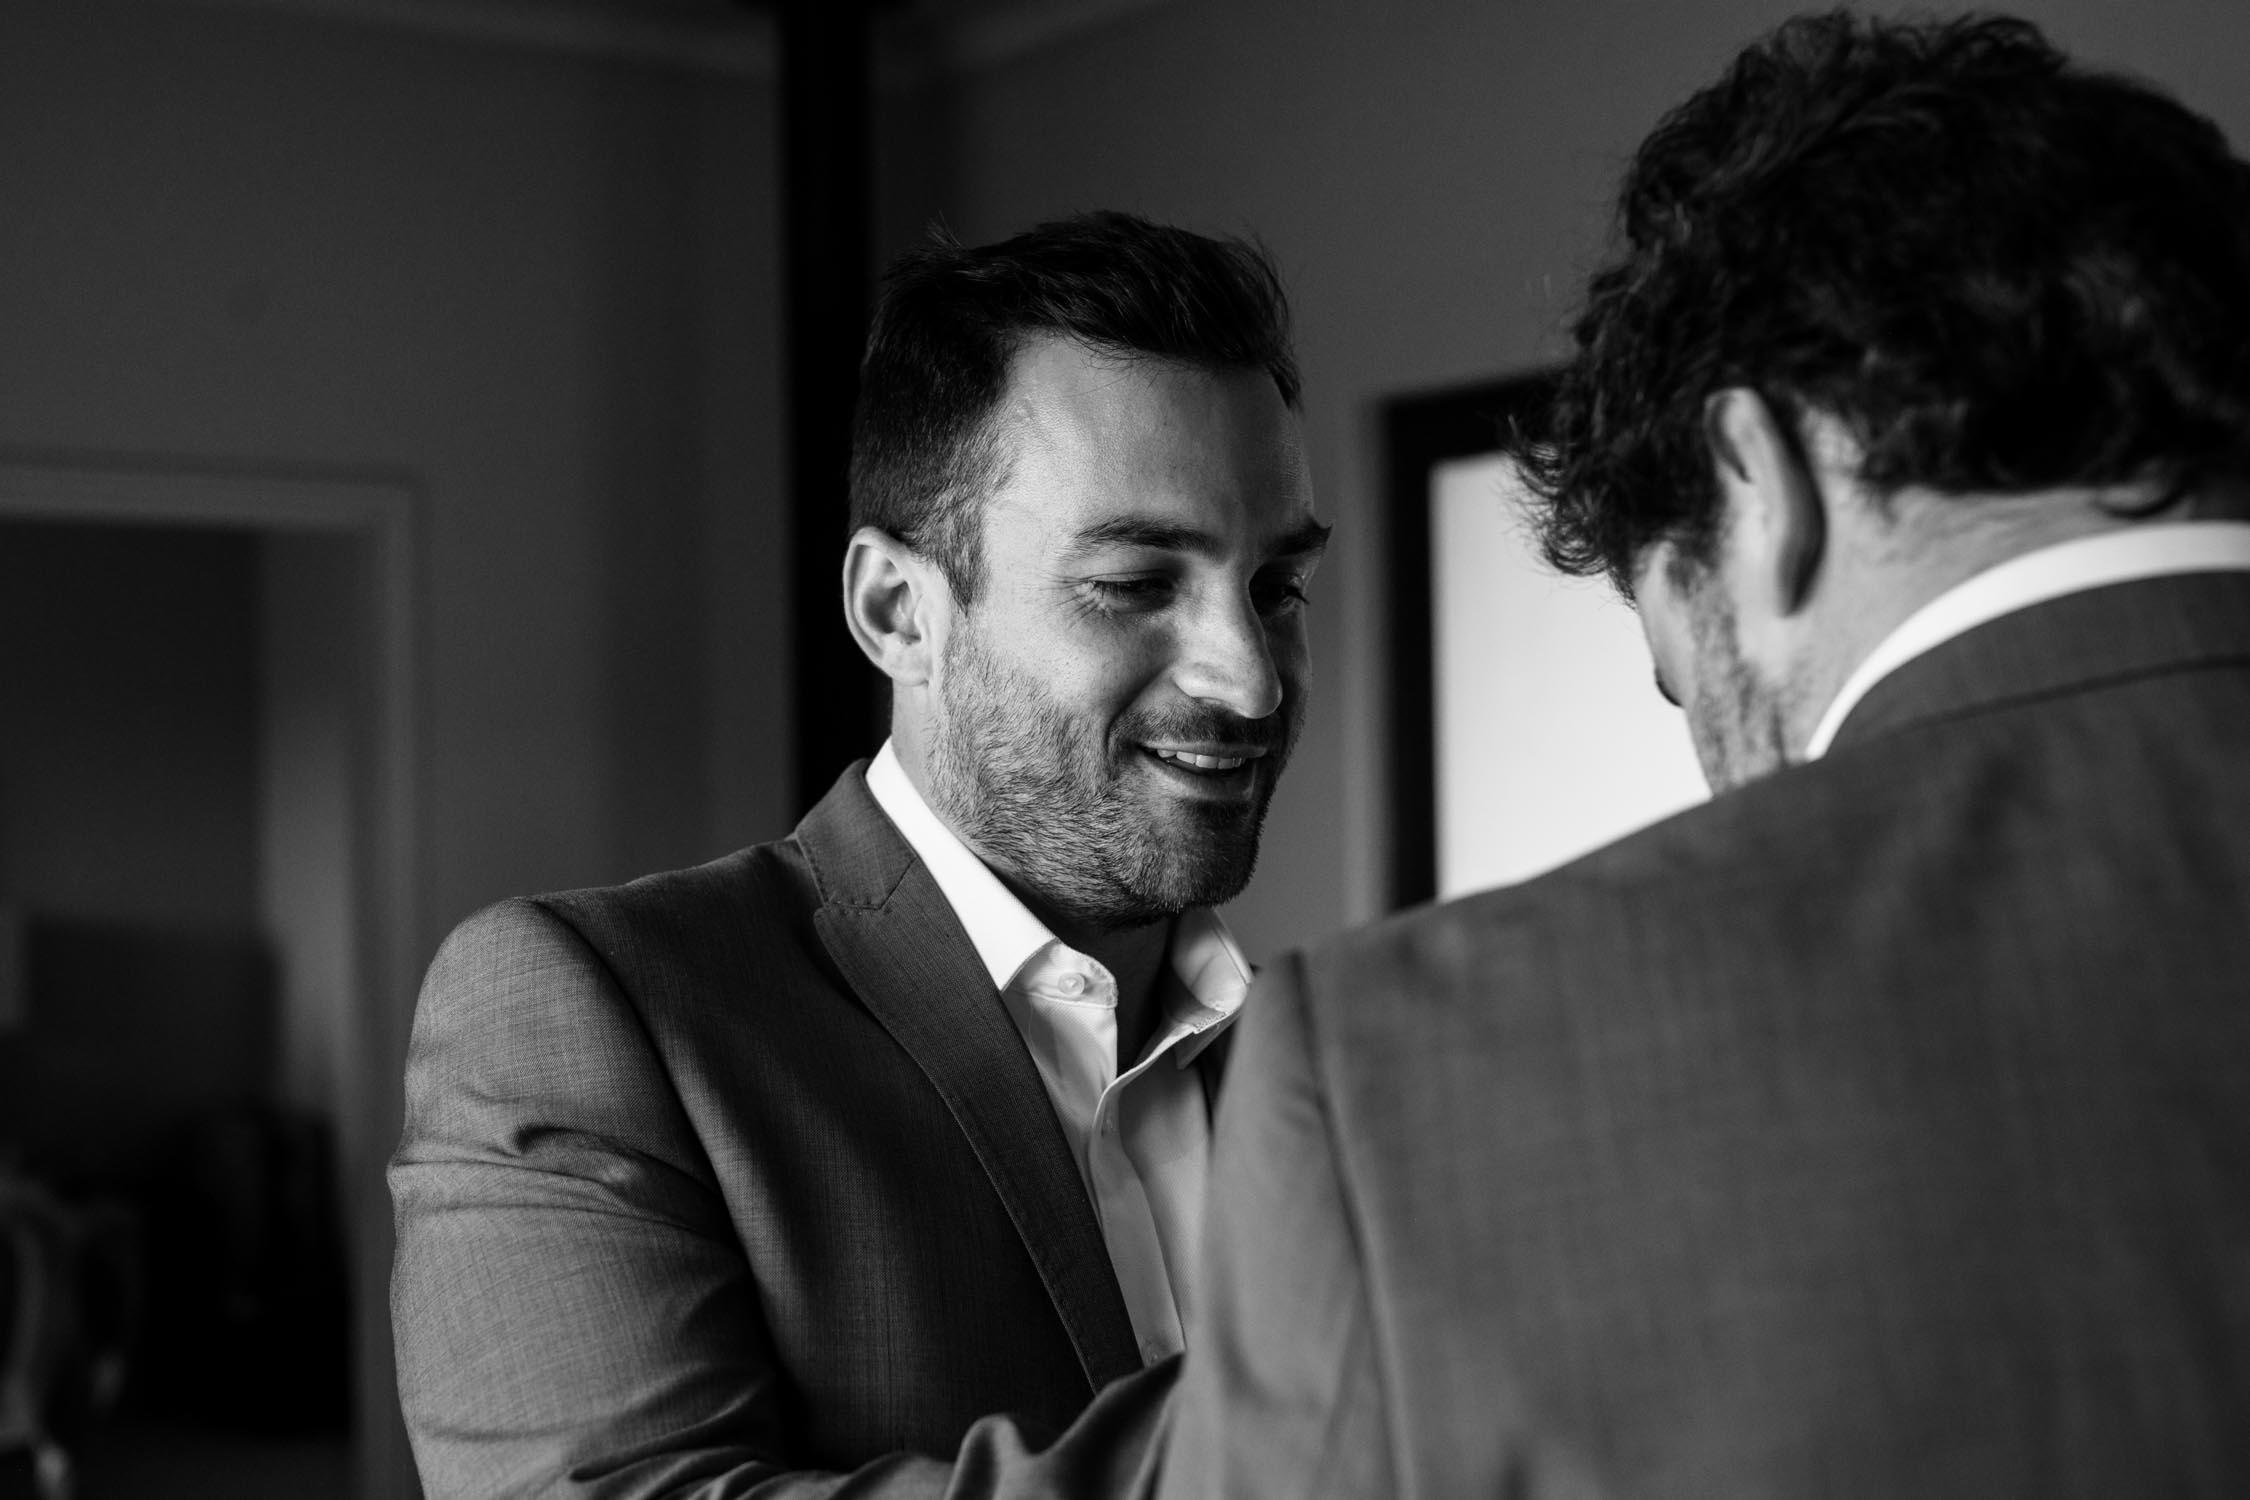 Groomsman with beard helping the groom get ready on his wedding day.